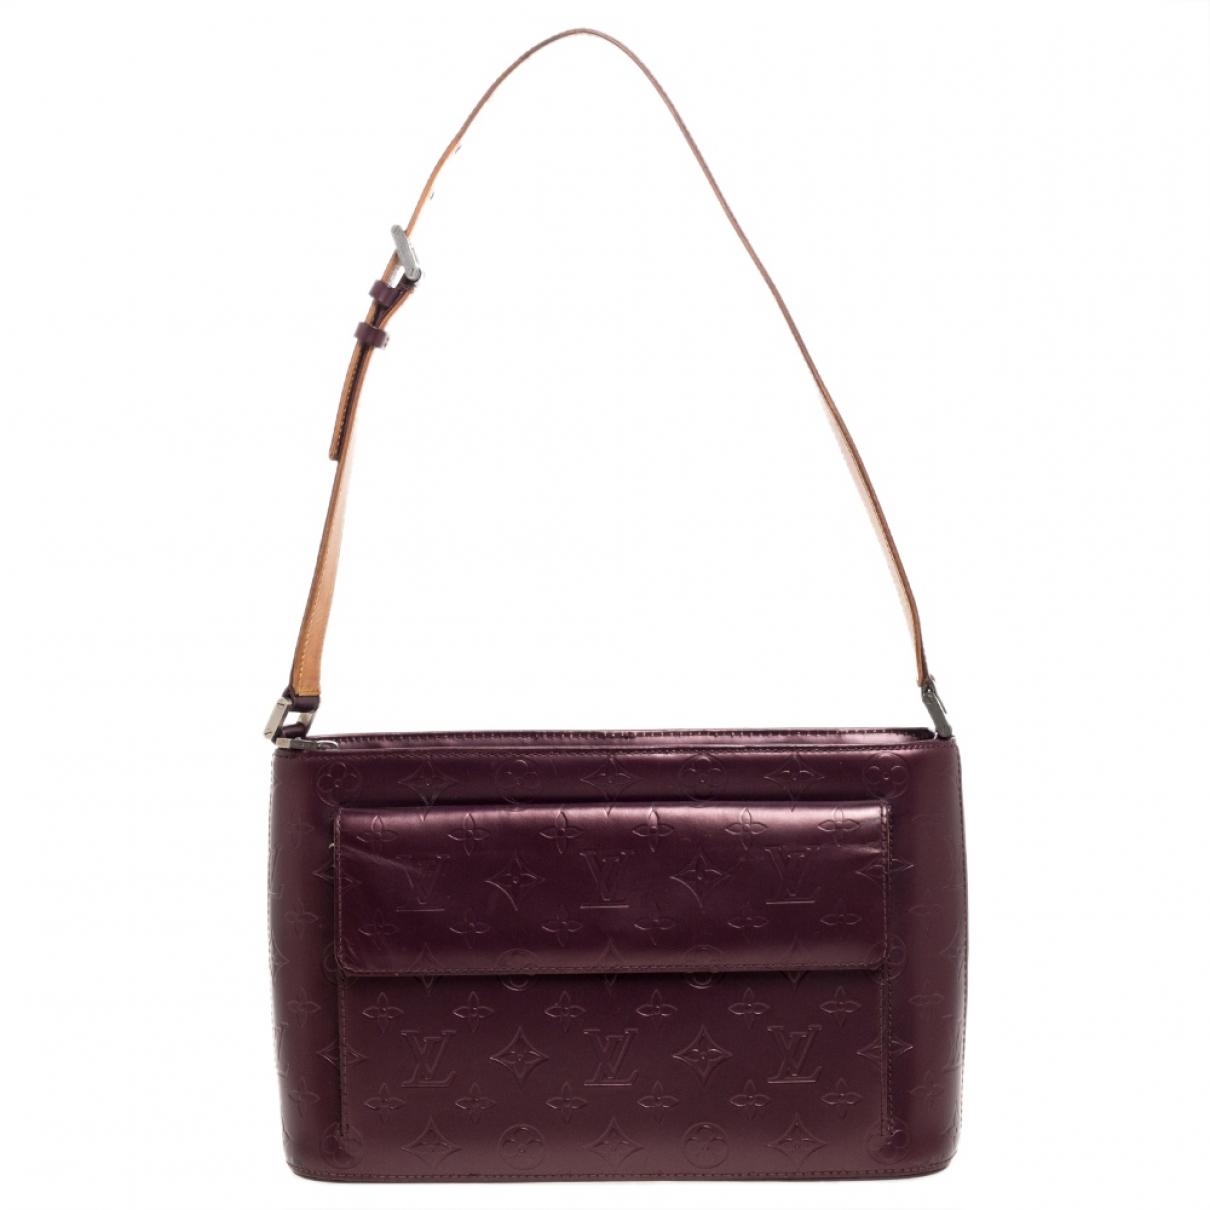 Louis Vuitton Allston Purple Leather handbag for Women N